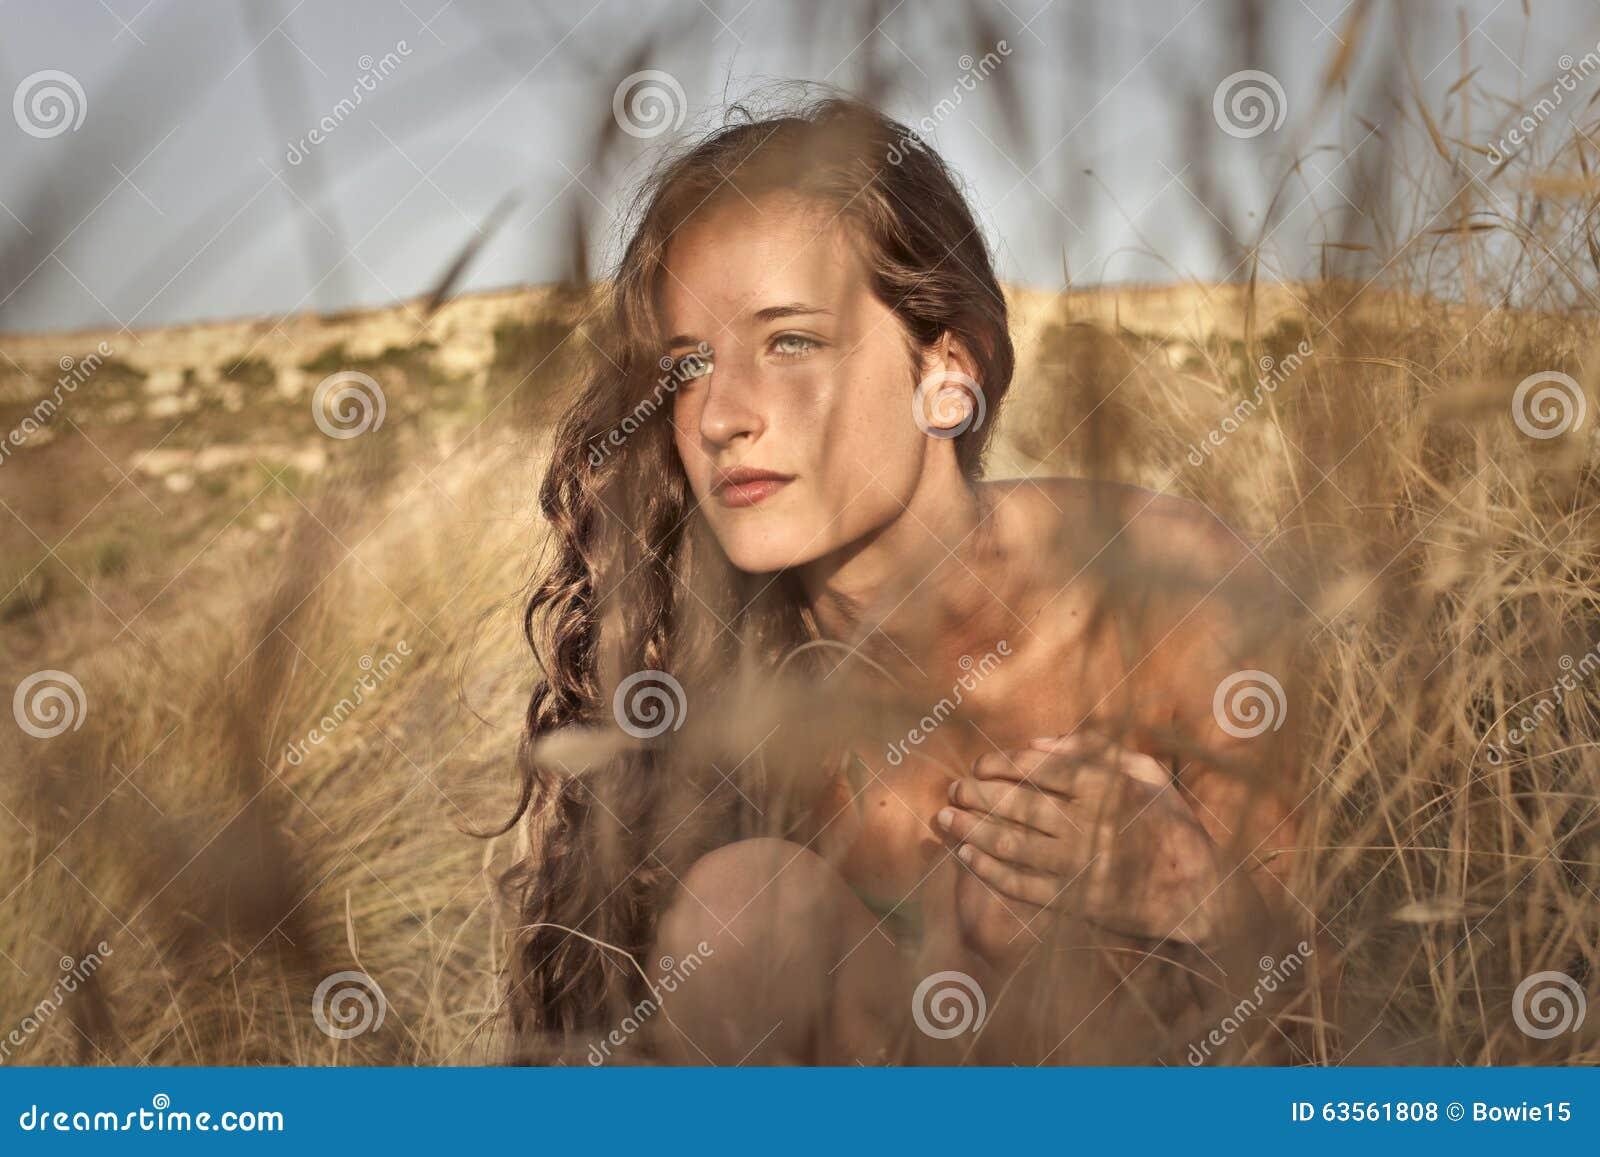 Nackt im kornfeld